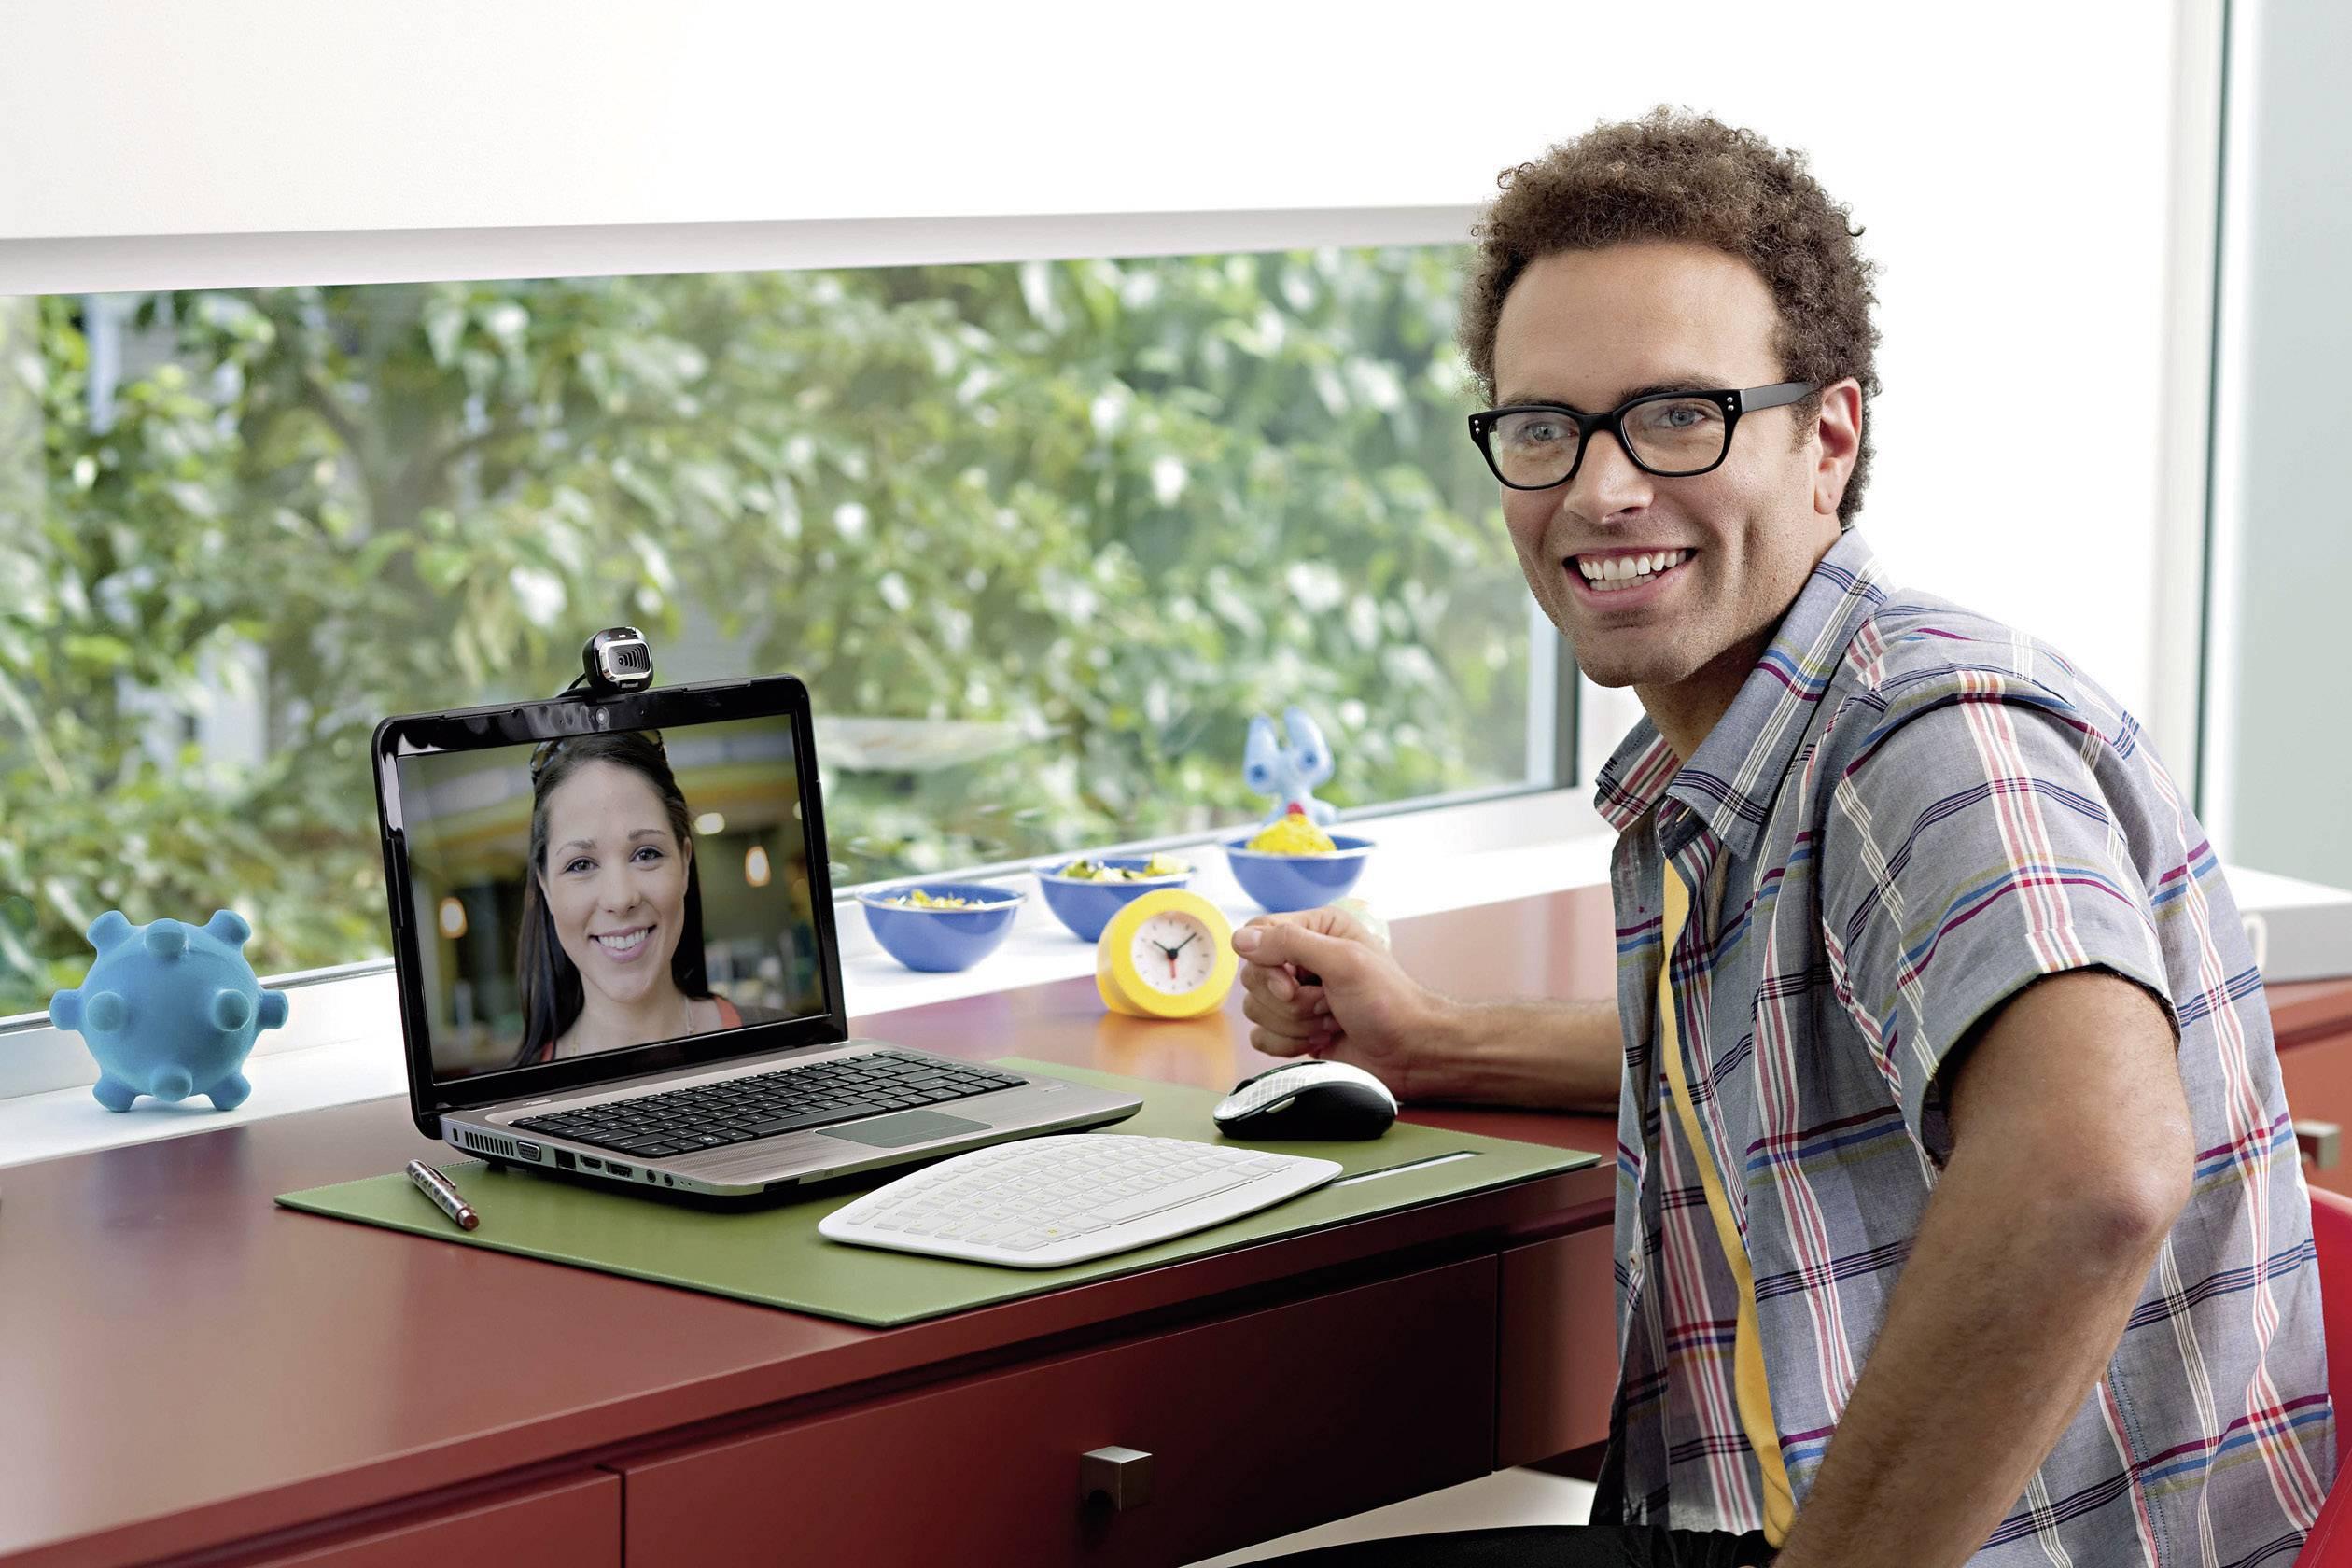 HD webkamera Microsoft LifeCam HD-3000